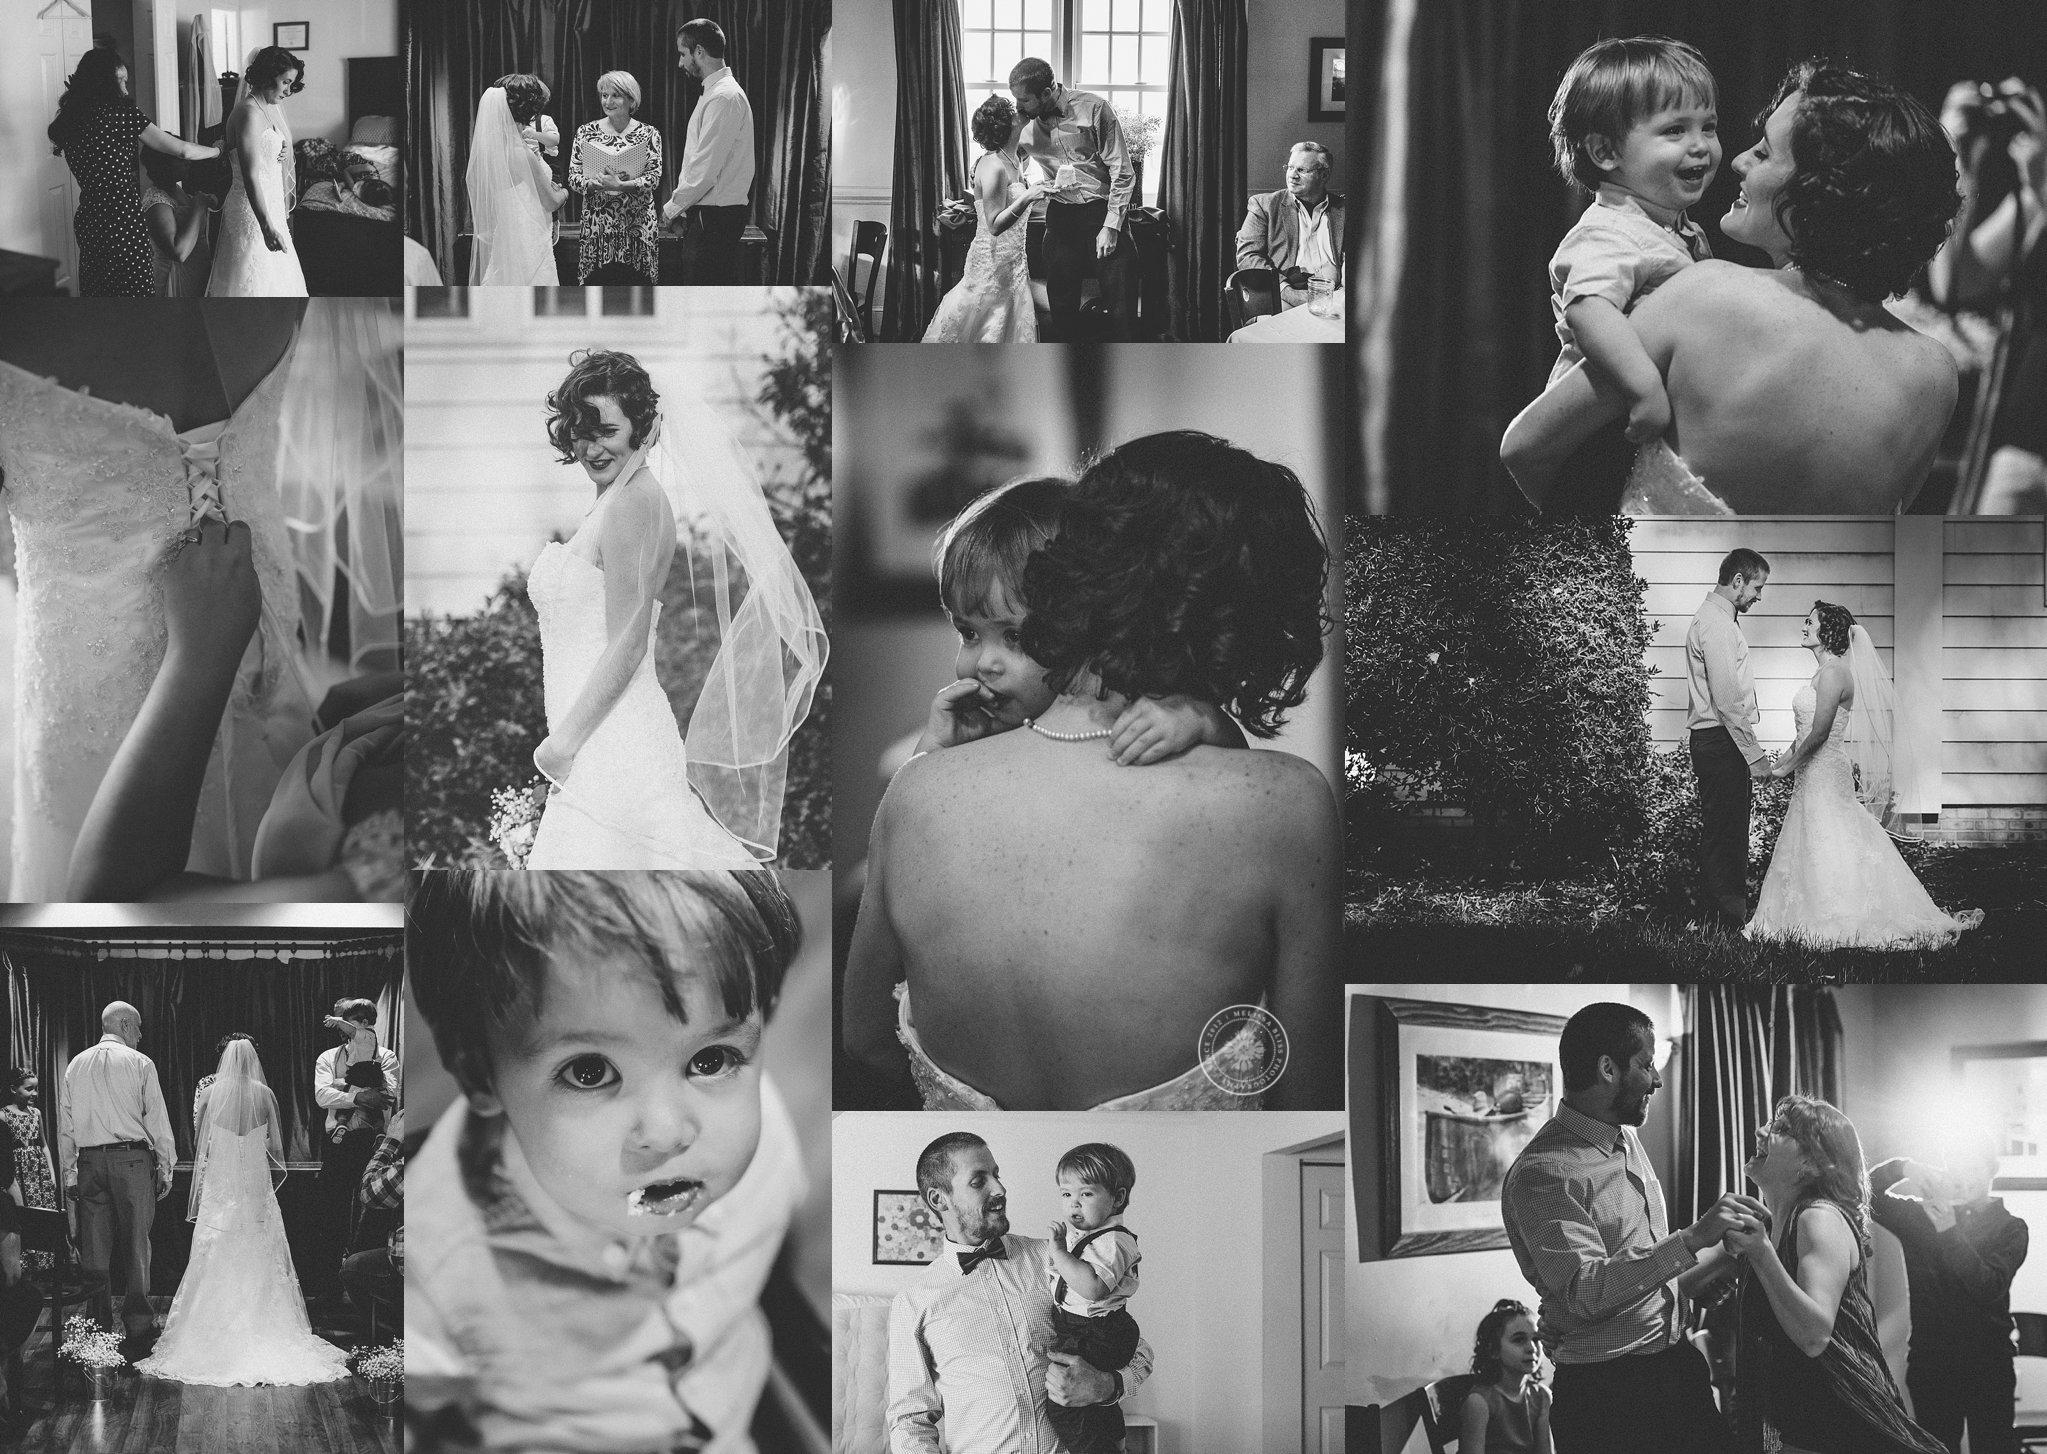 virginia-beach-norfolk-chesapeake-portsmouth-documentary-wedding-photographers-black-and-white-wedding-photography-melissa-bliss-photography-candid-real-weddings